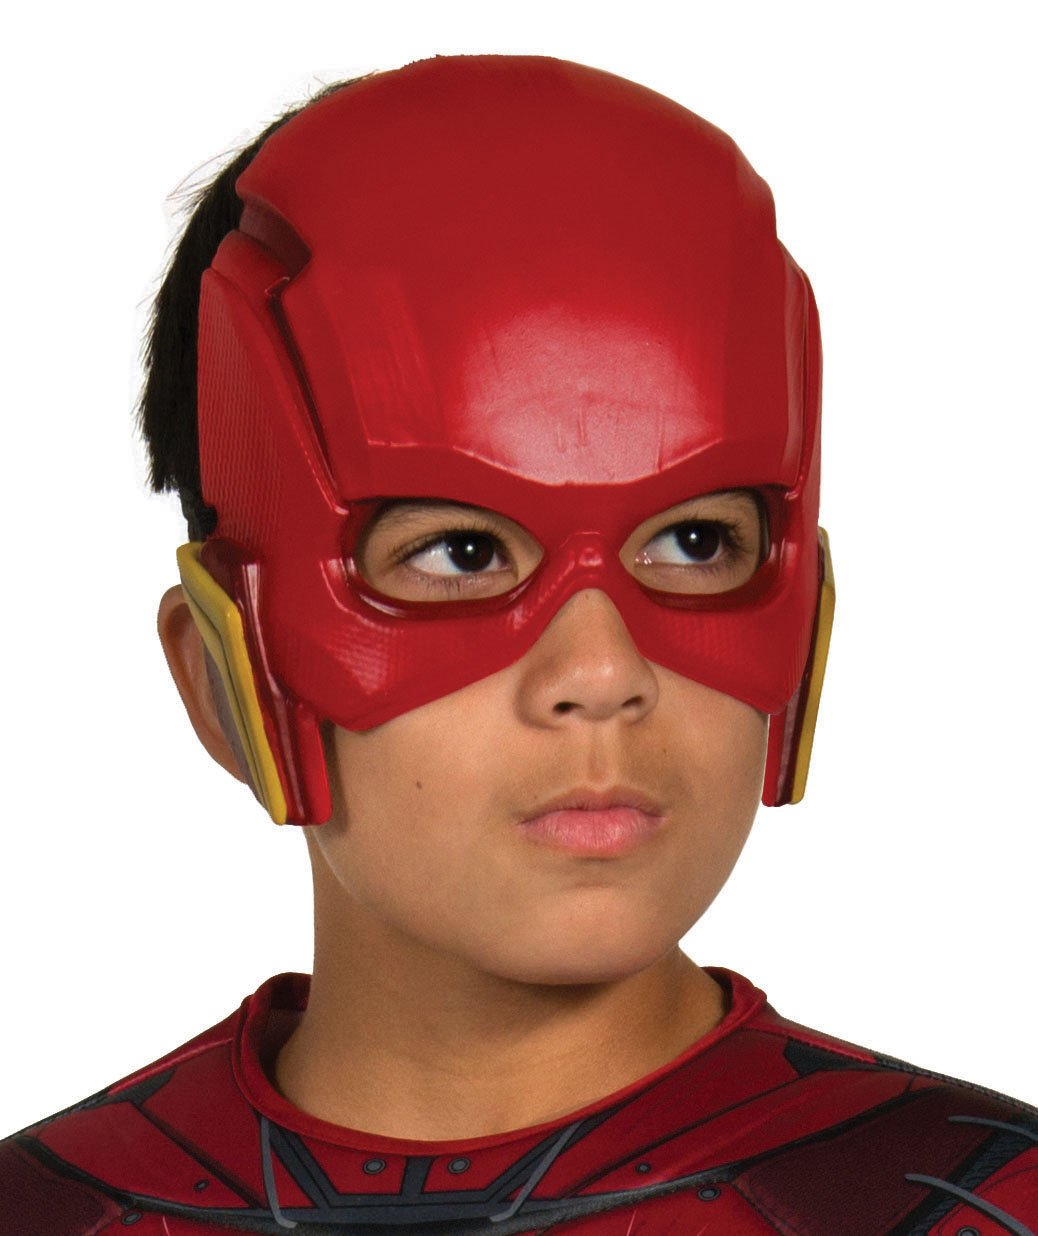 Flash Máscara Justice League Movie Infantil, Talla única (Rubie'S Spain 34273) Rubie' s Spain